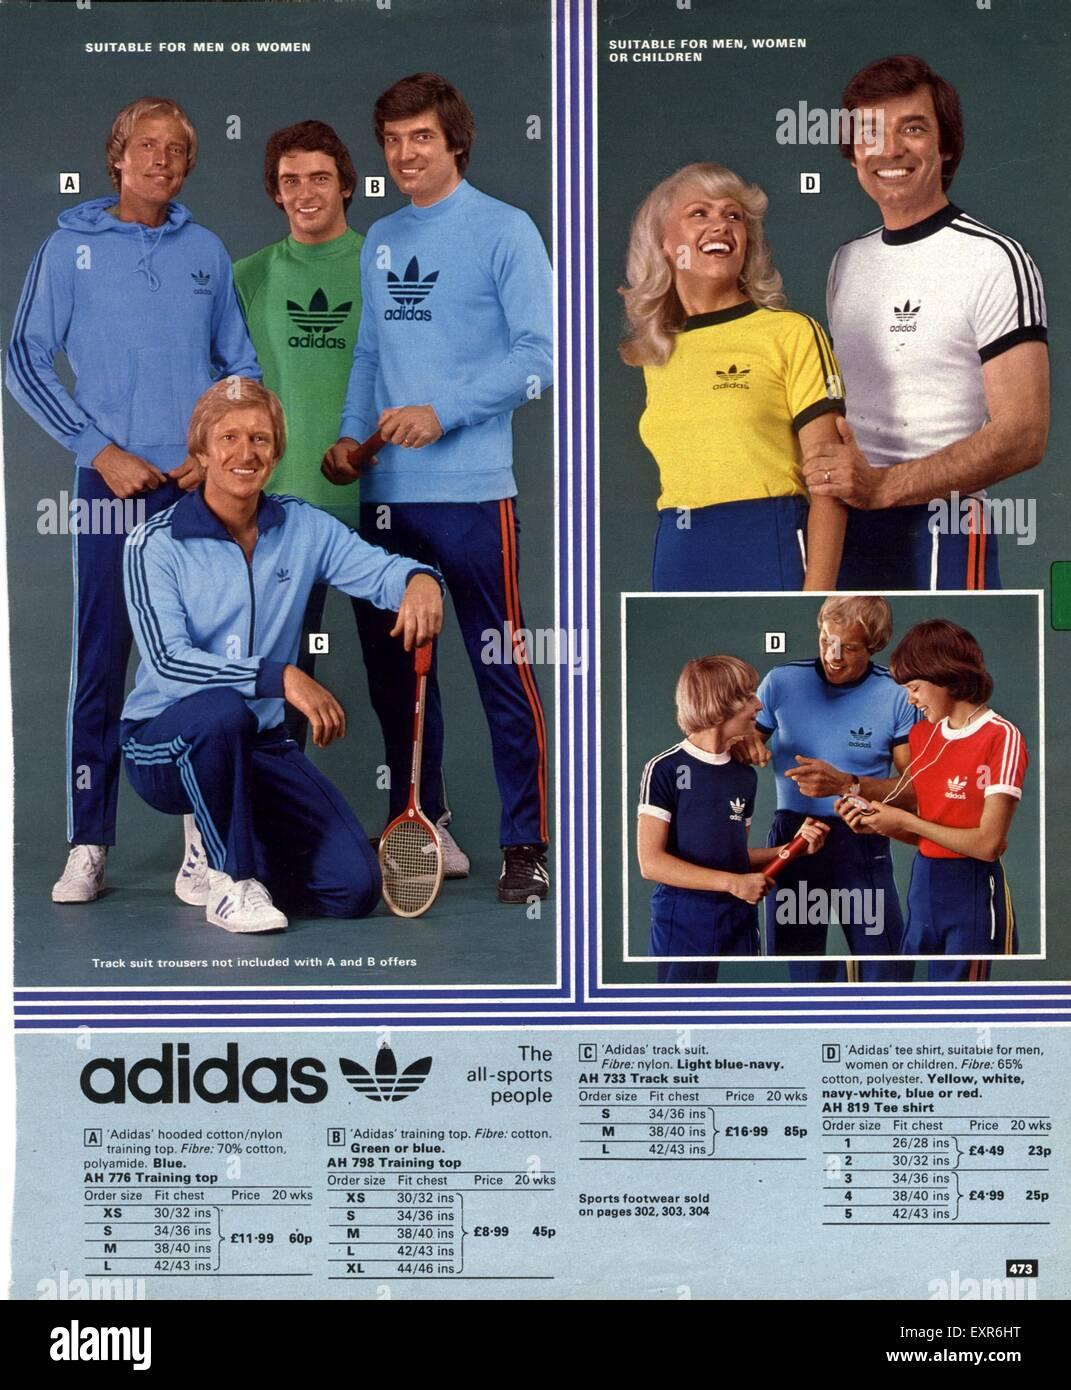 1970s Uk Adidas Magazine Advert Stock Photo Alamy